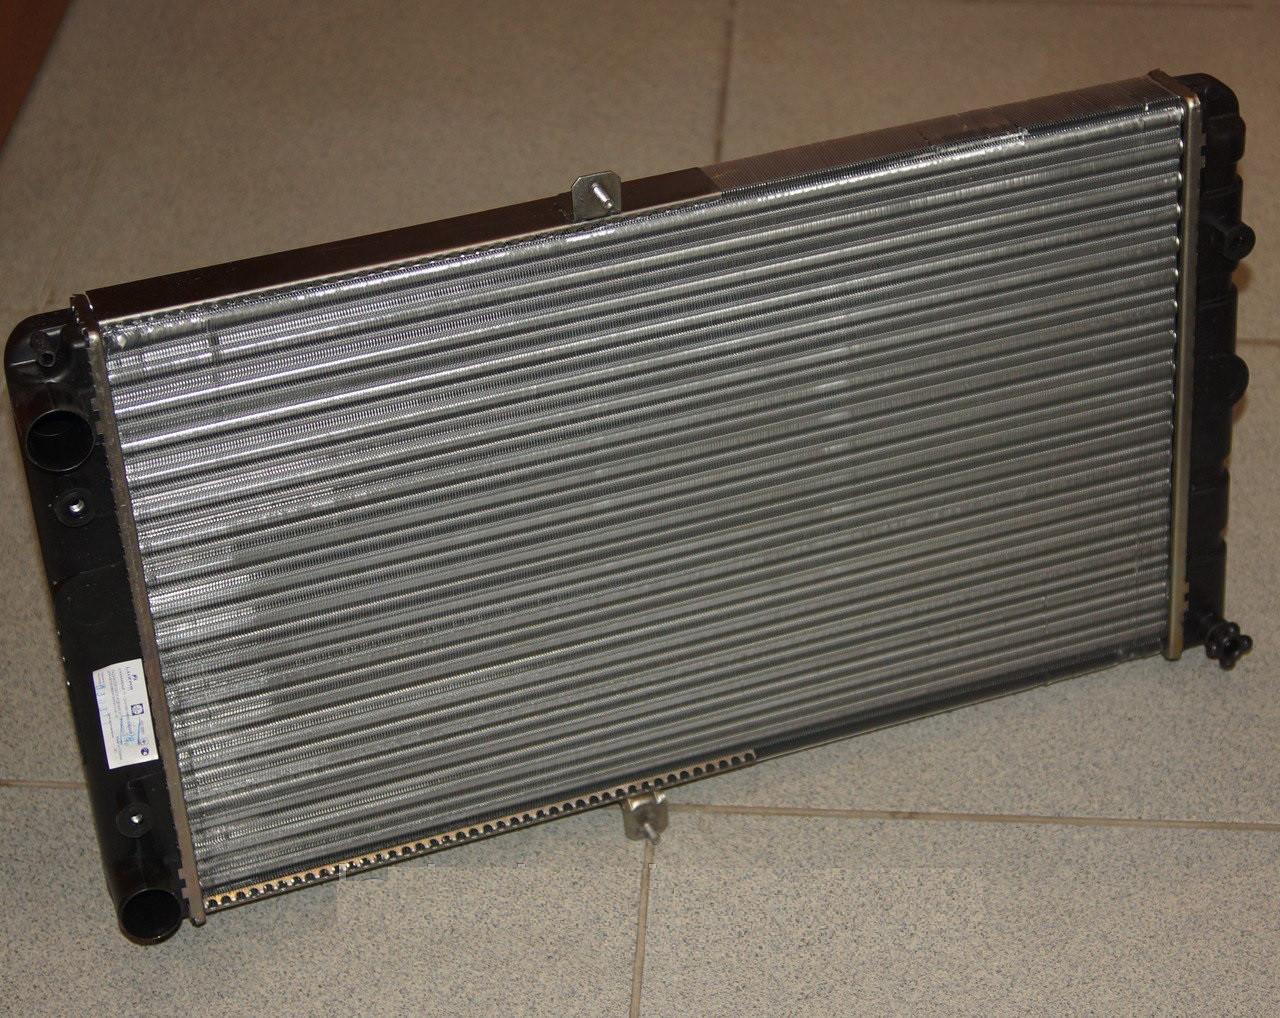 Радиатор вод. охлажд. ВАЗ 2110,-11,-12 (карб) (пр-во ДААЗ), 21120-130101200